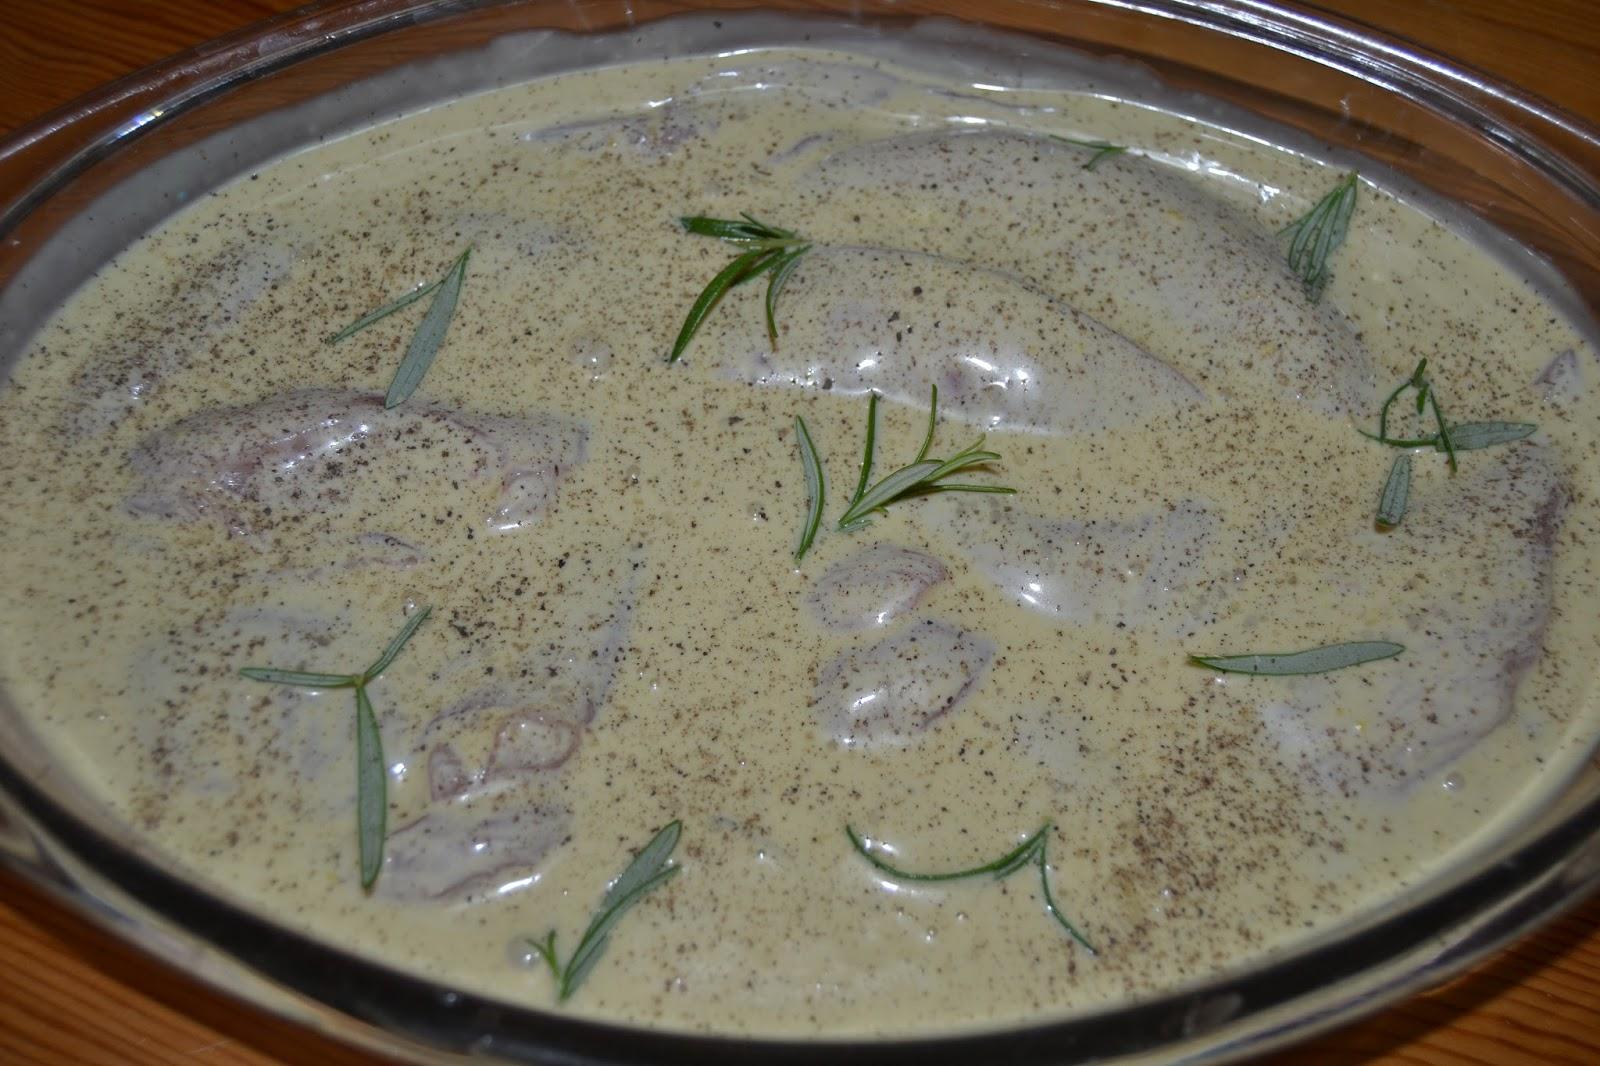 Mi taller de cocina pechugas de pollo al horno en salsa - Salsas para el pollo al horno ...